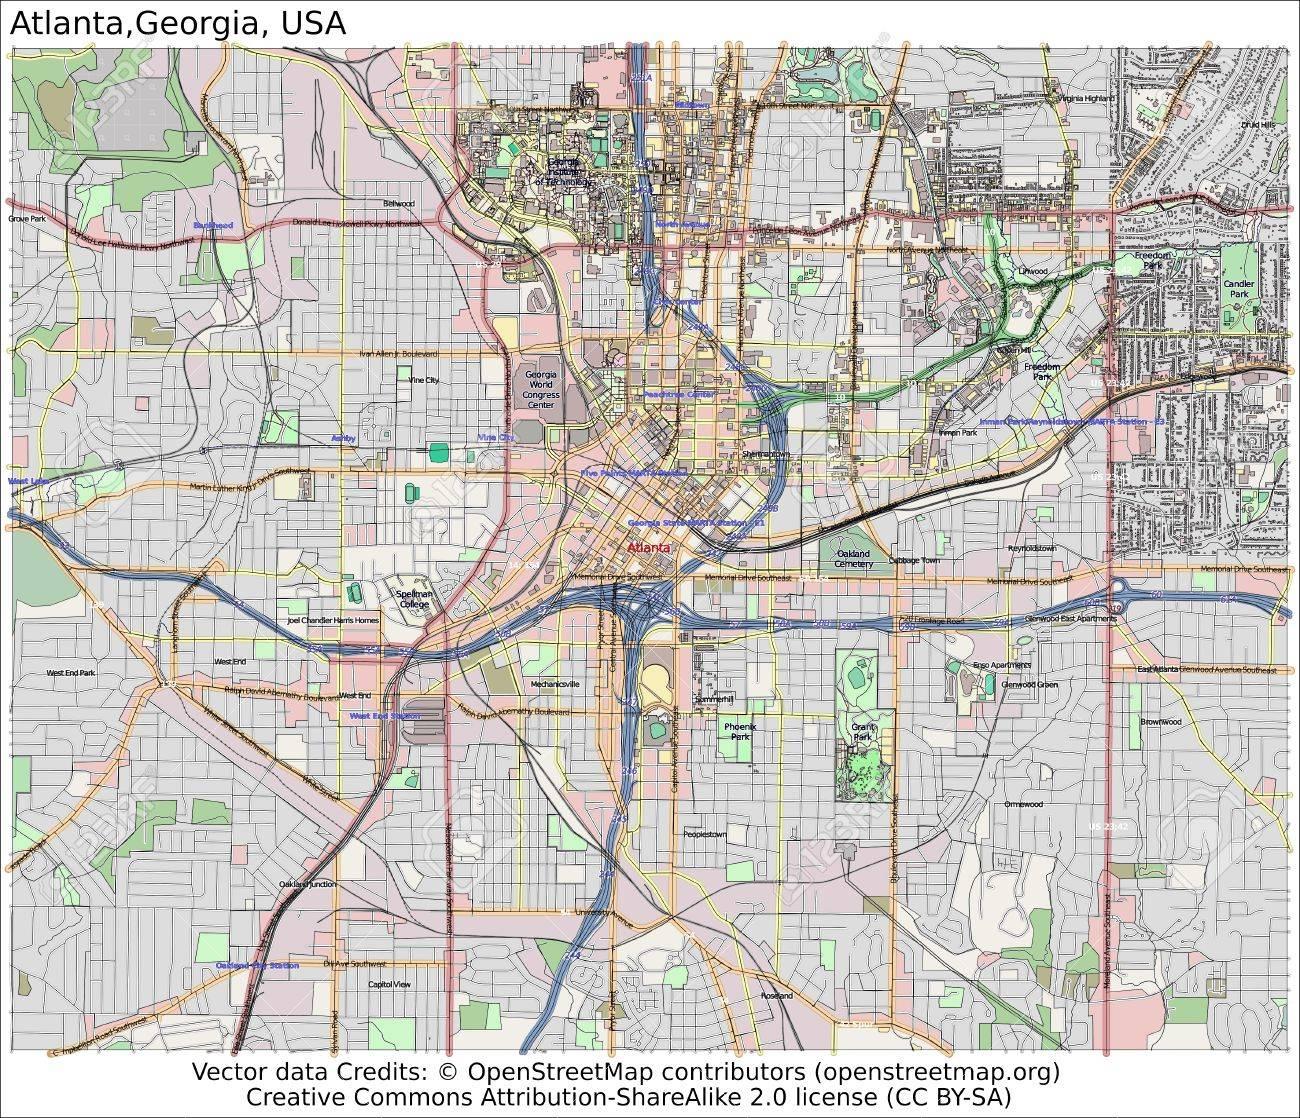 City Map Of Atlanta Georgia.Atlanta Georgia City Map Aerial View Stock Photo Picture And